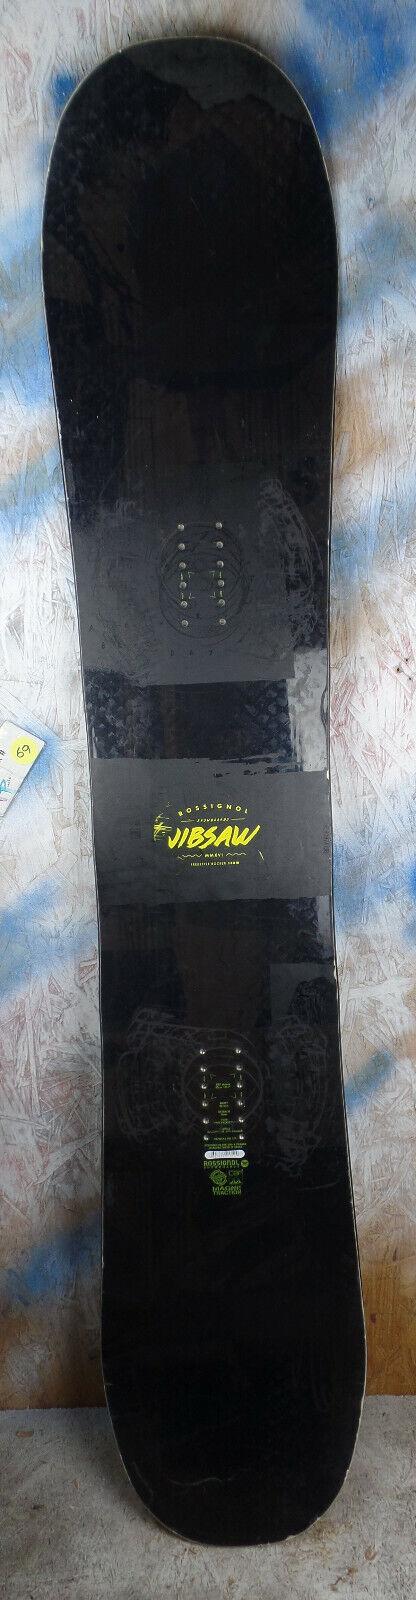 2017 Rossignol  Jibsaw 158cm WIDE  store online